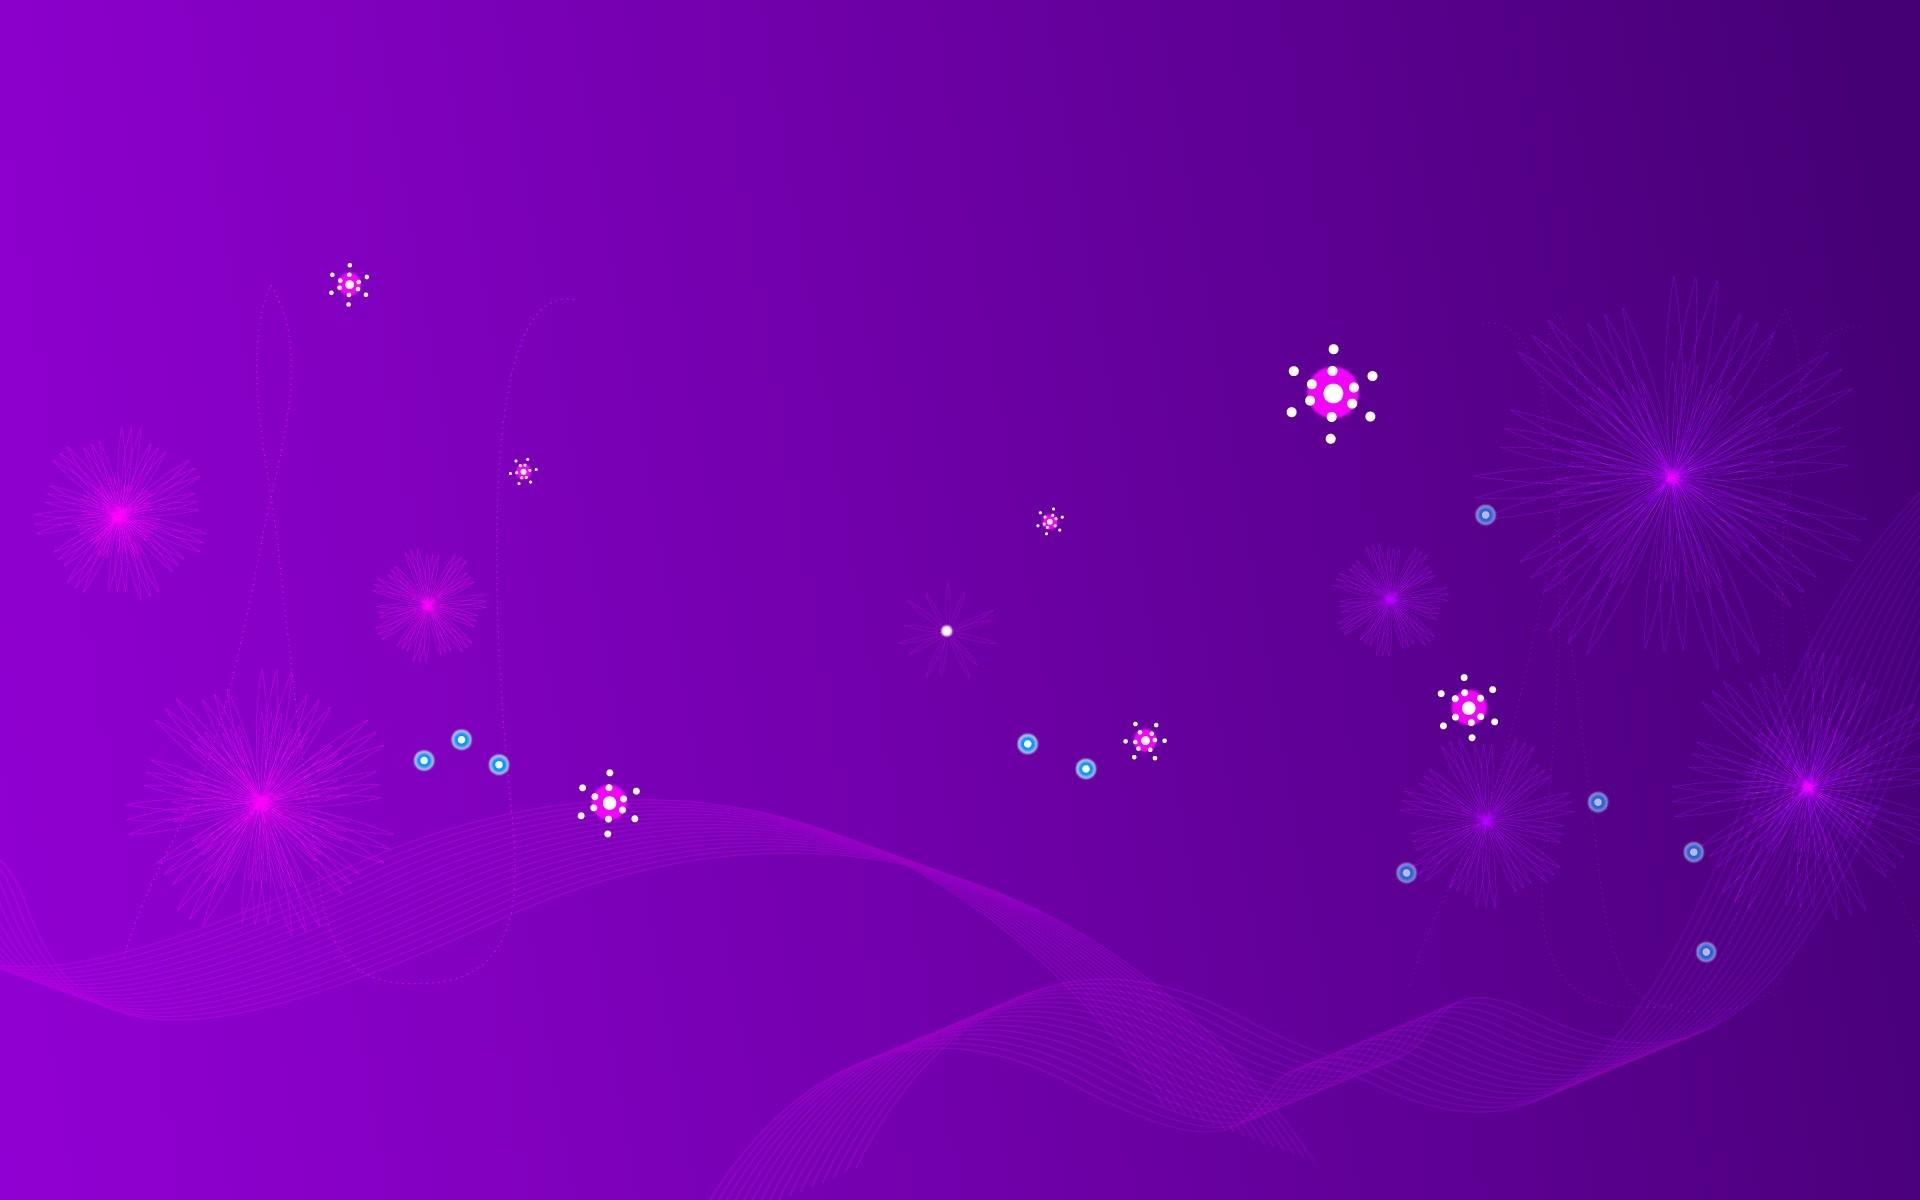 Wallpaper light shine star shining purple colors 1920x1200 light shine star shining purple colors voltagebd Gallery